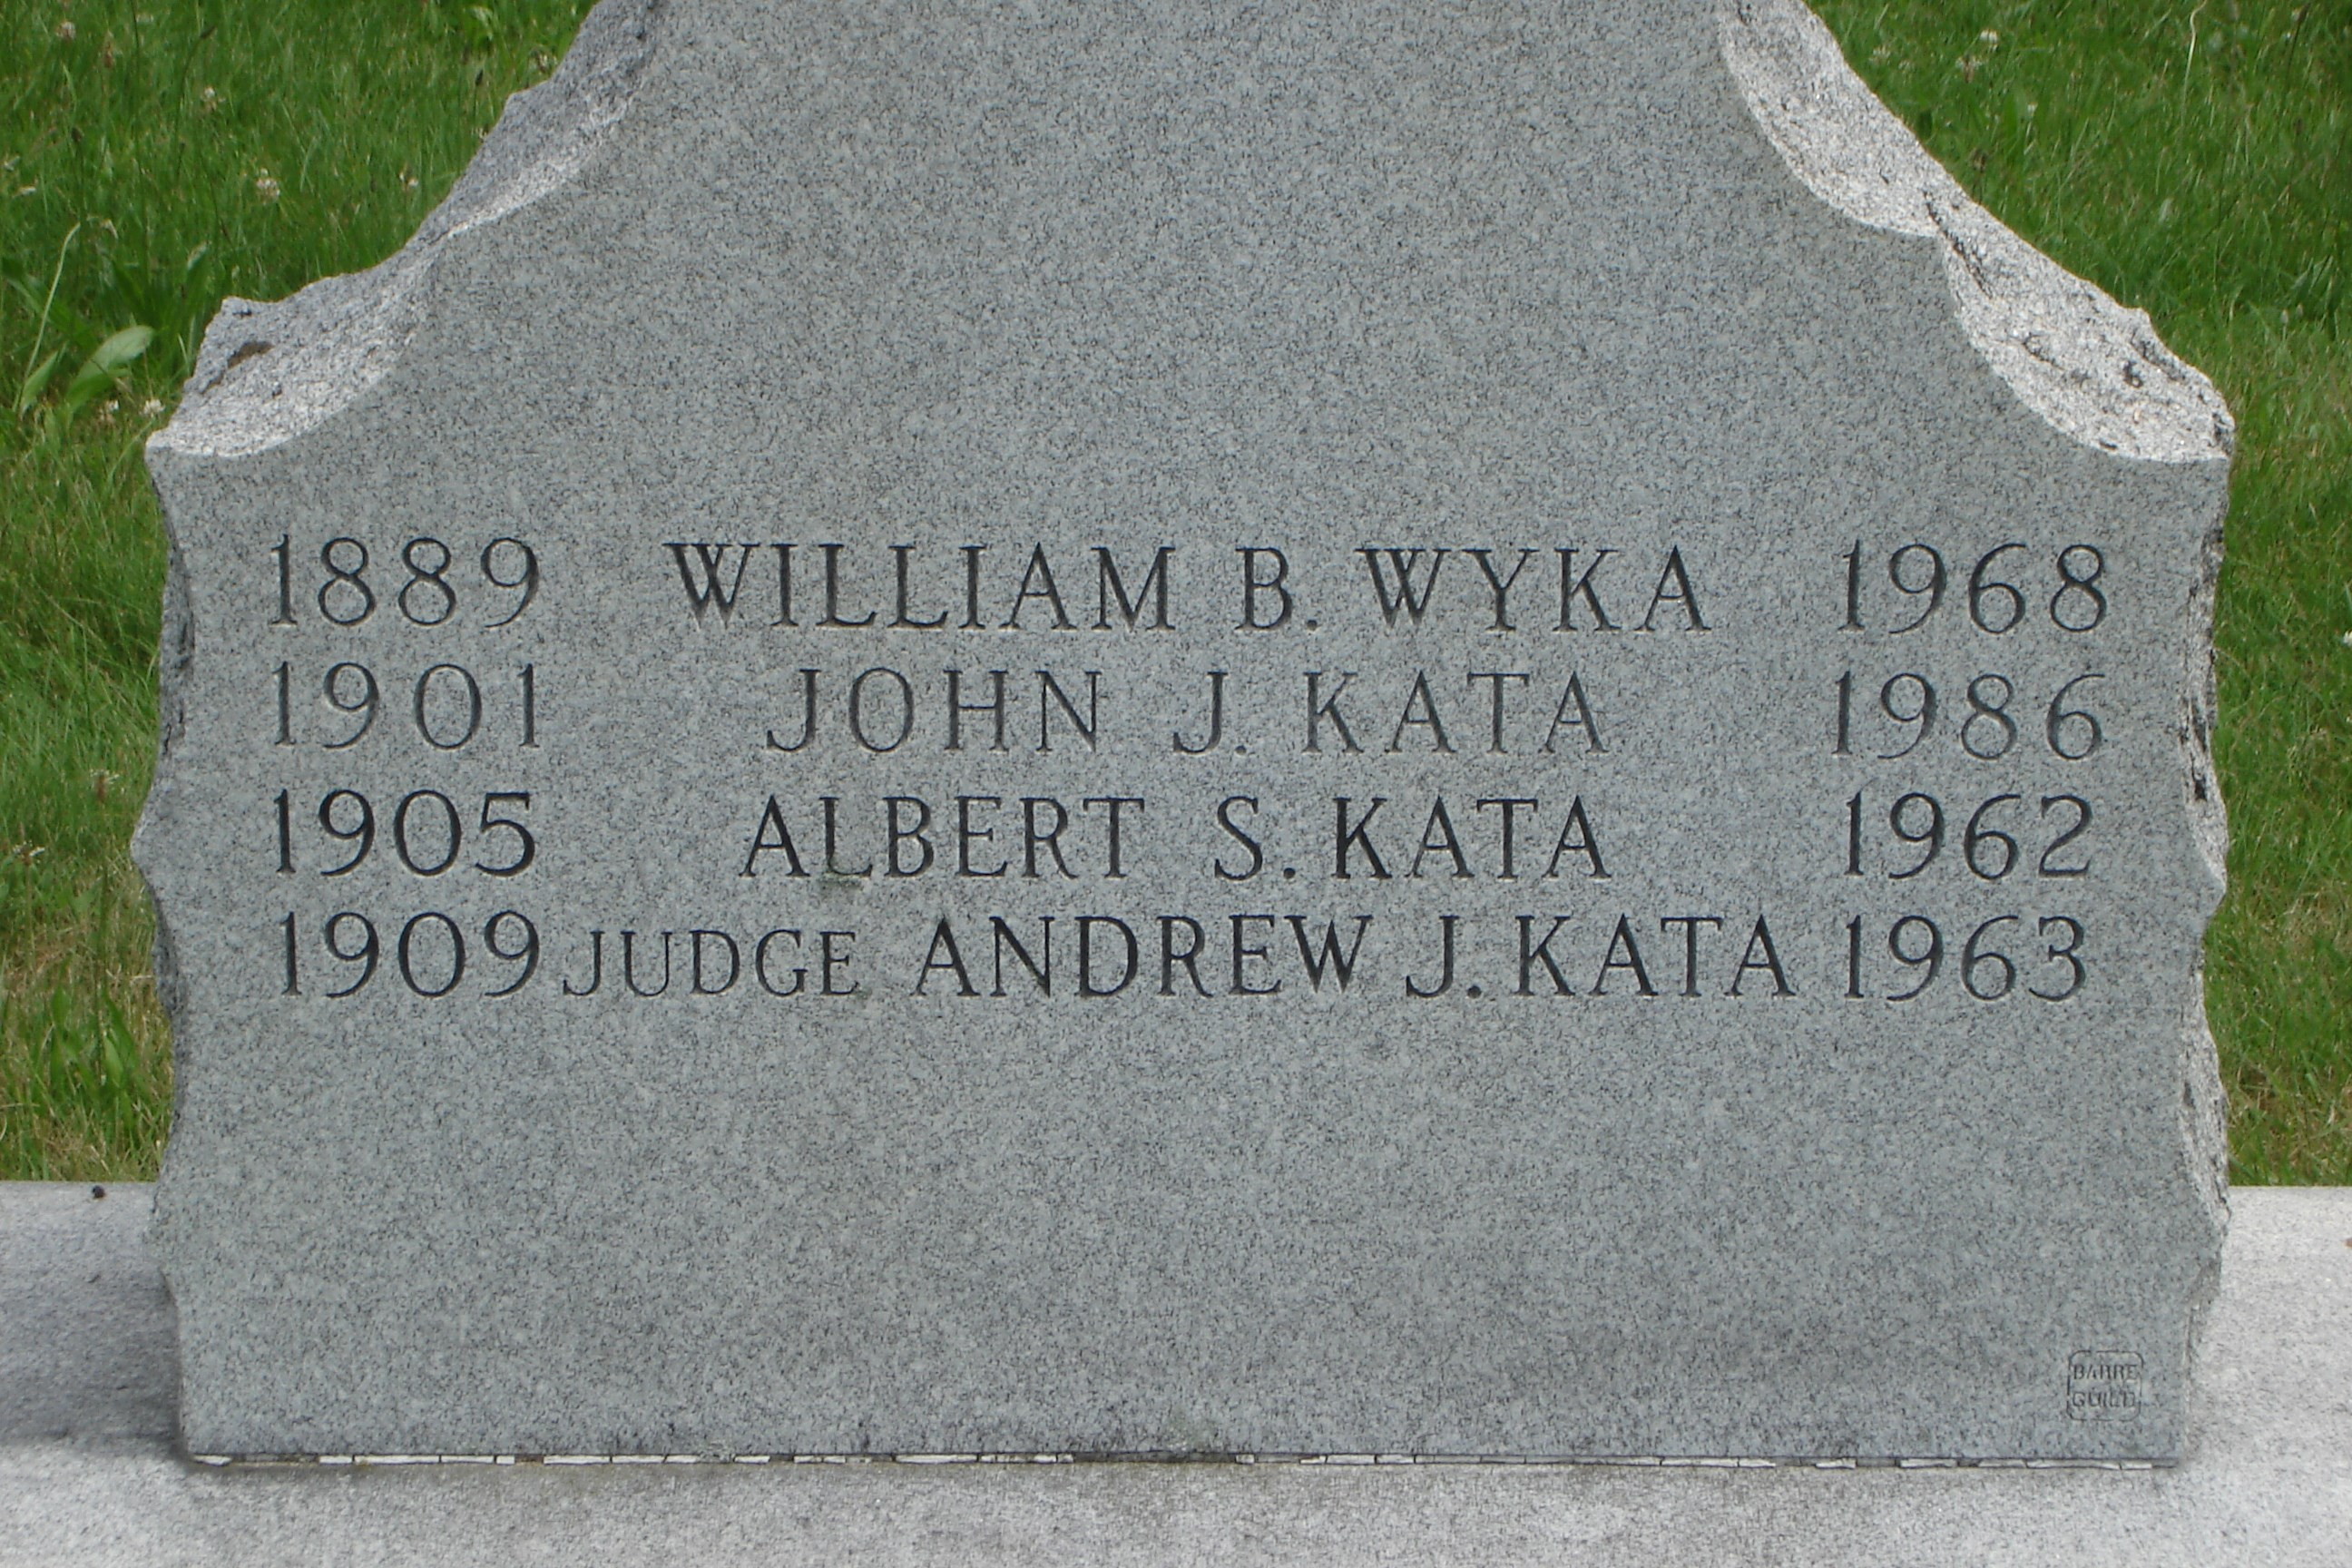 John Kata